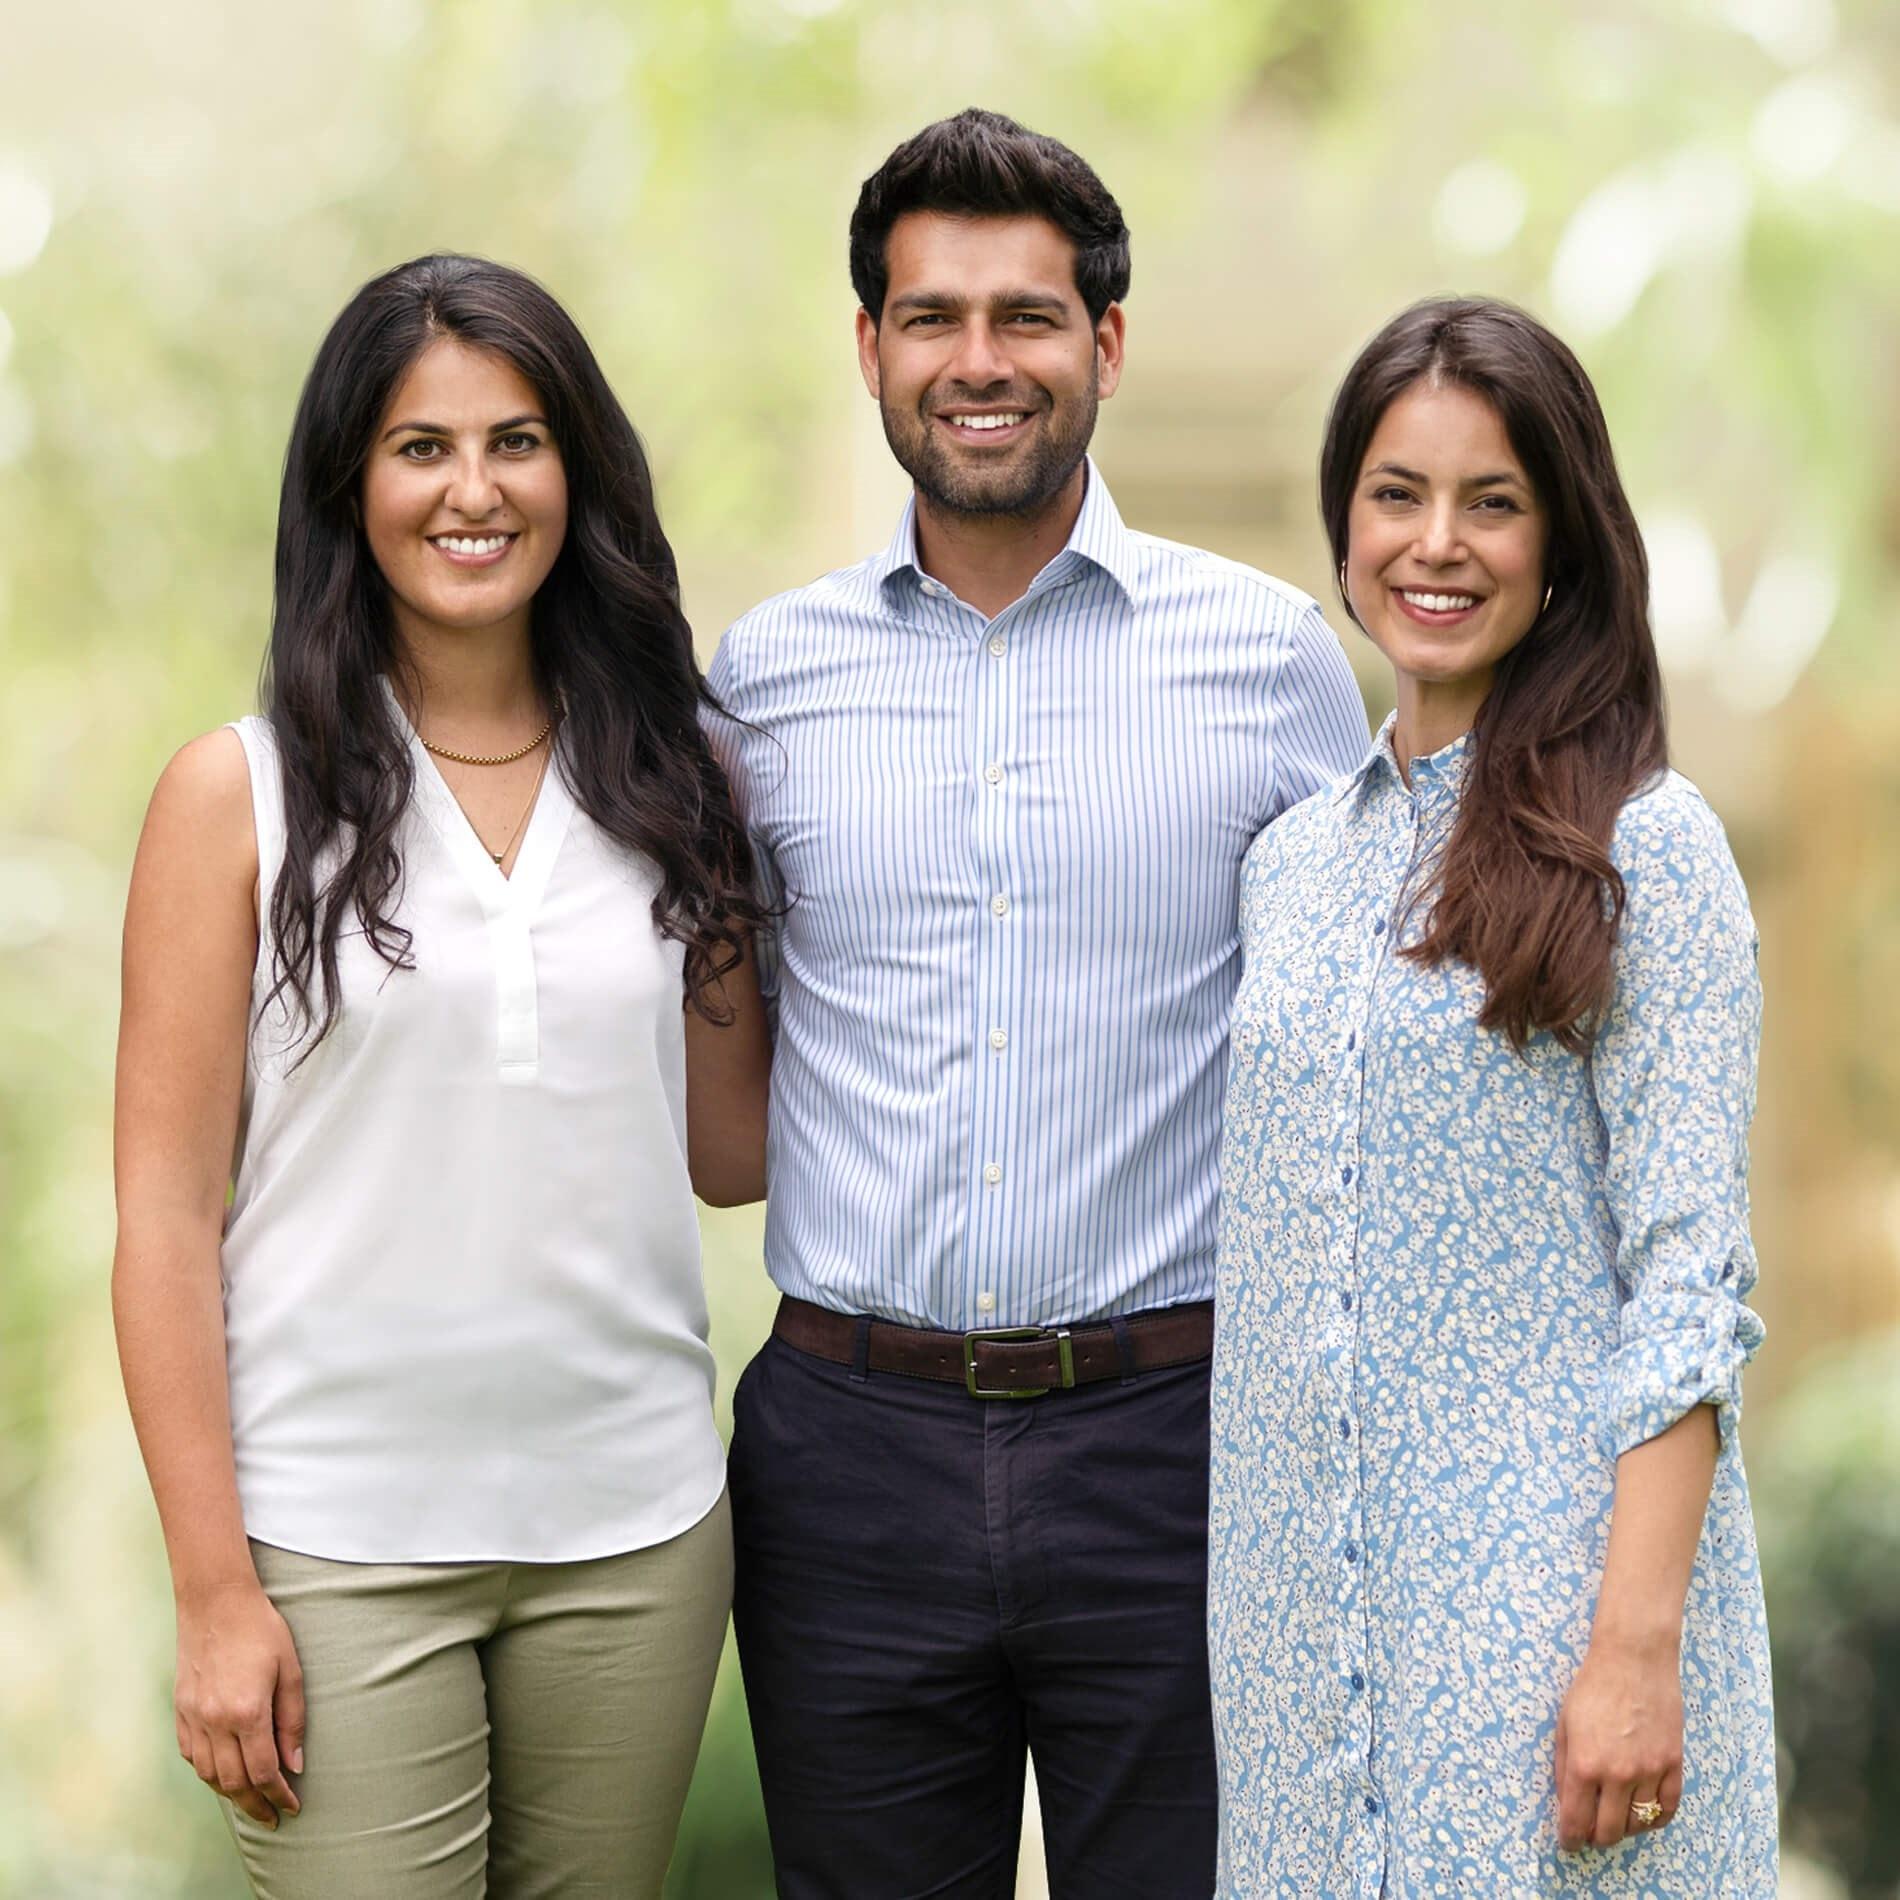 OptiBac Probiotics founders